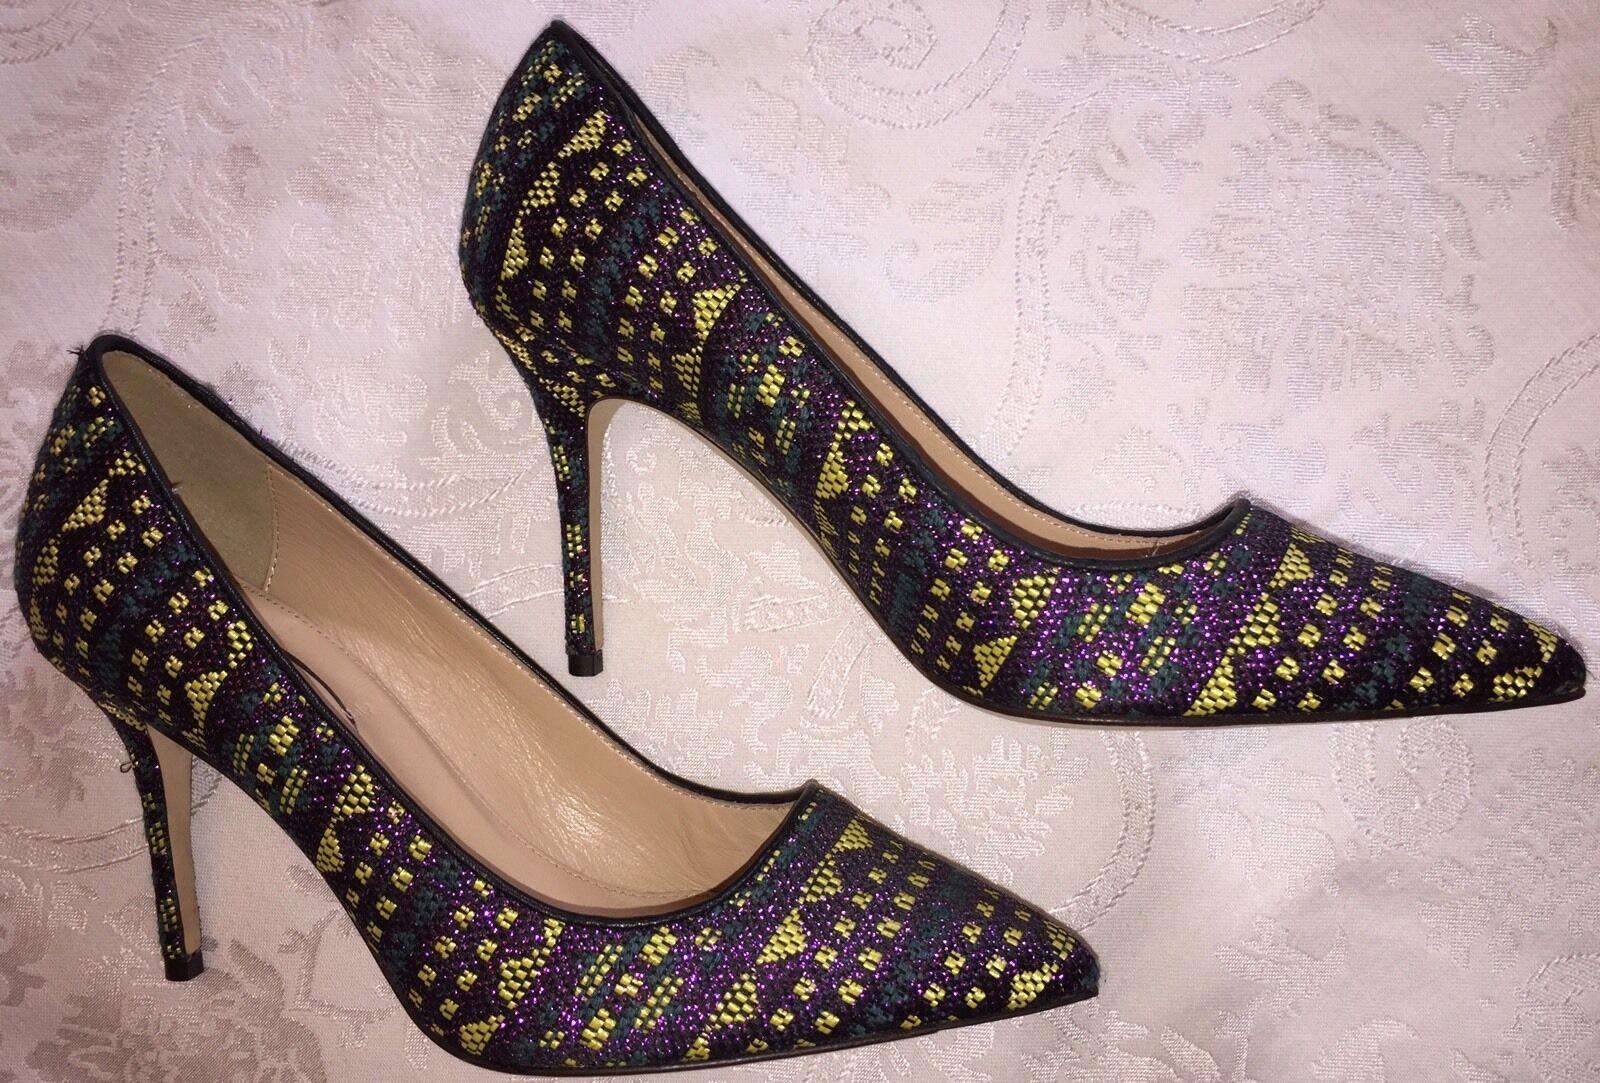 J Crew 6.5 Elsie Pumps Heels c1036 NEW 268 Sold Out